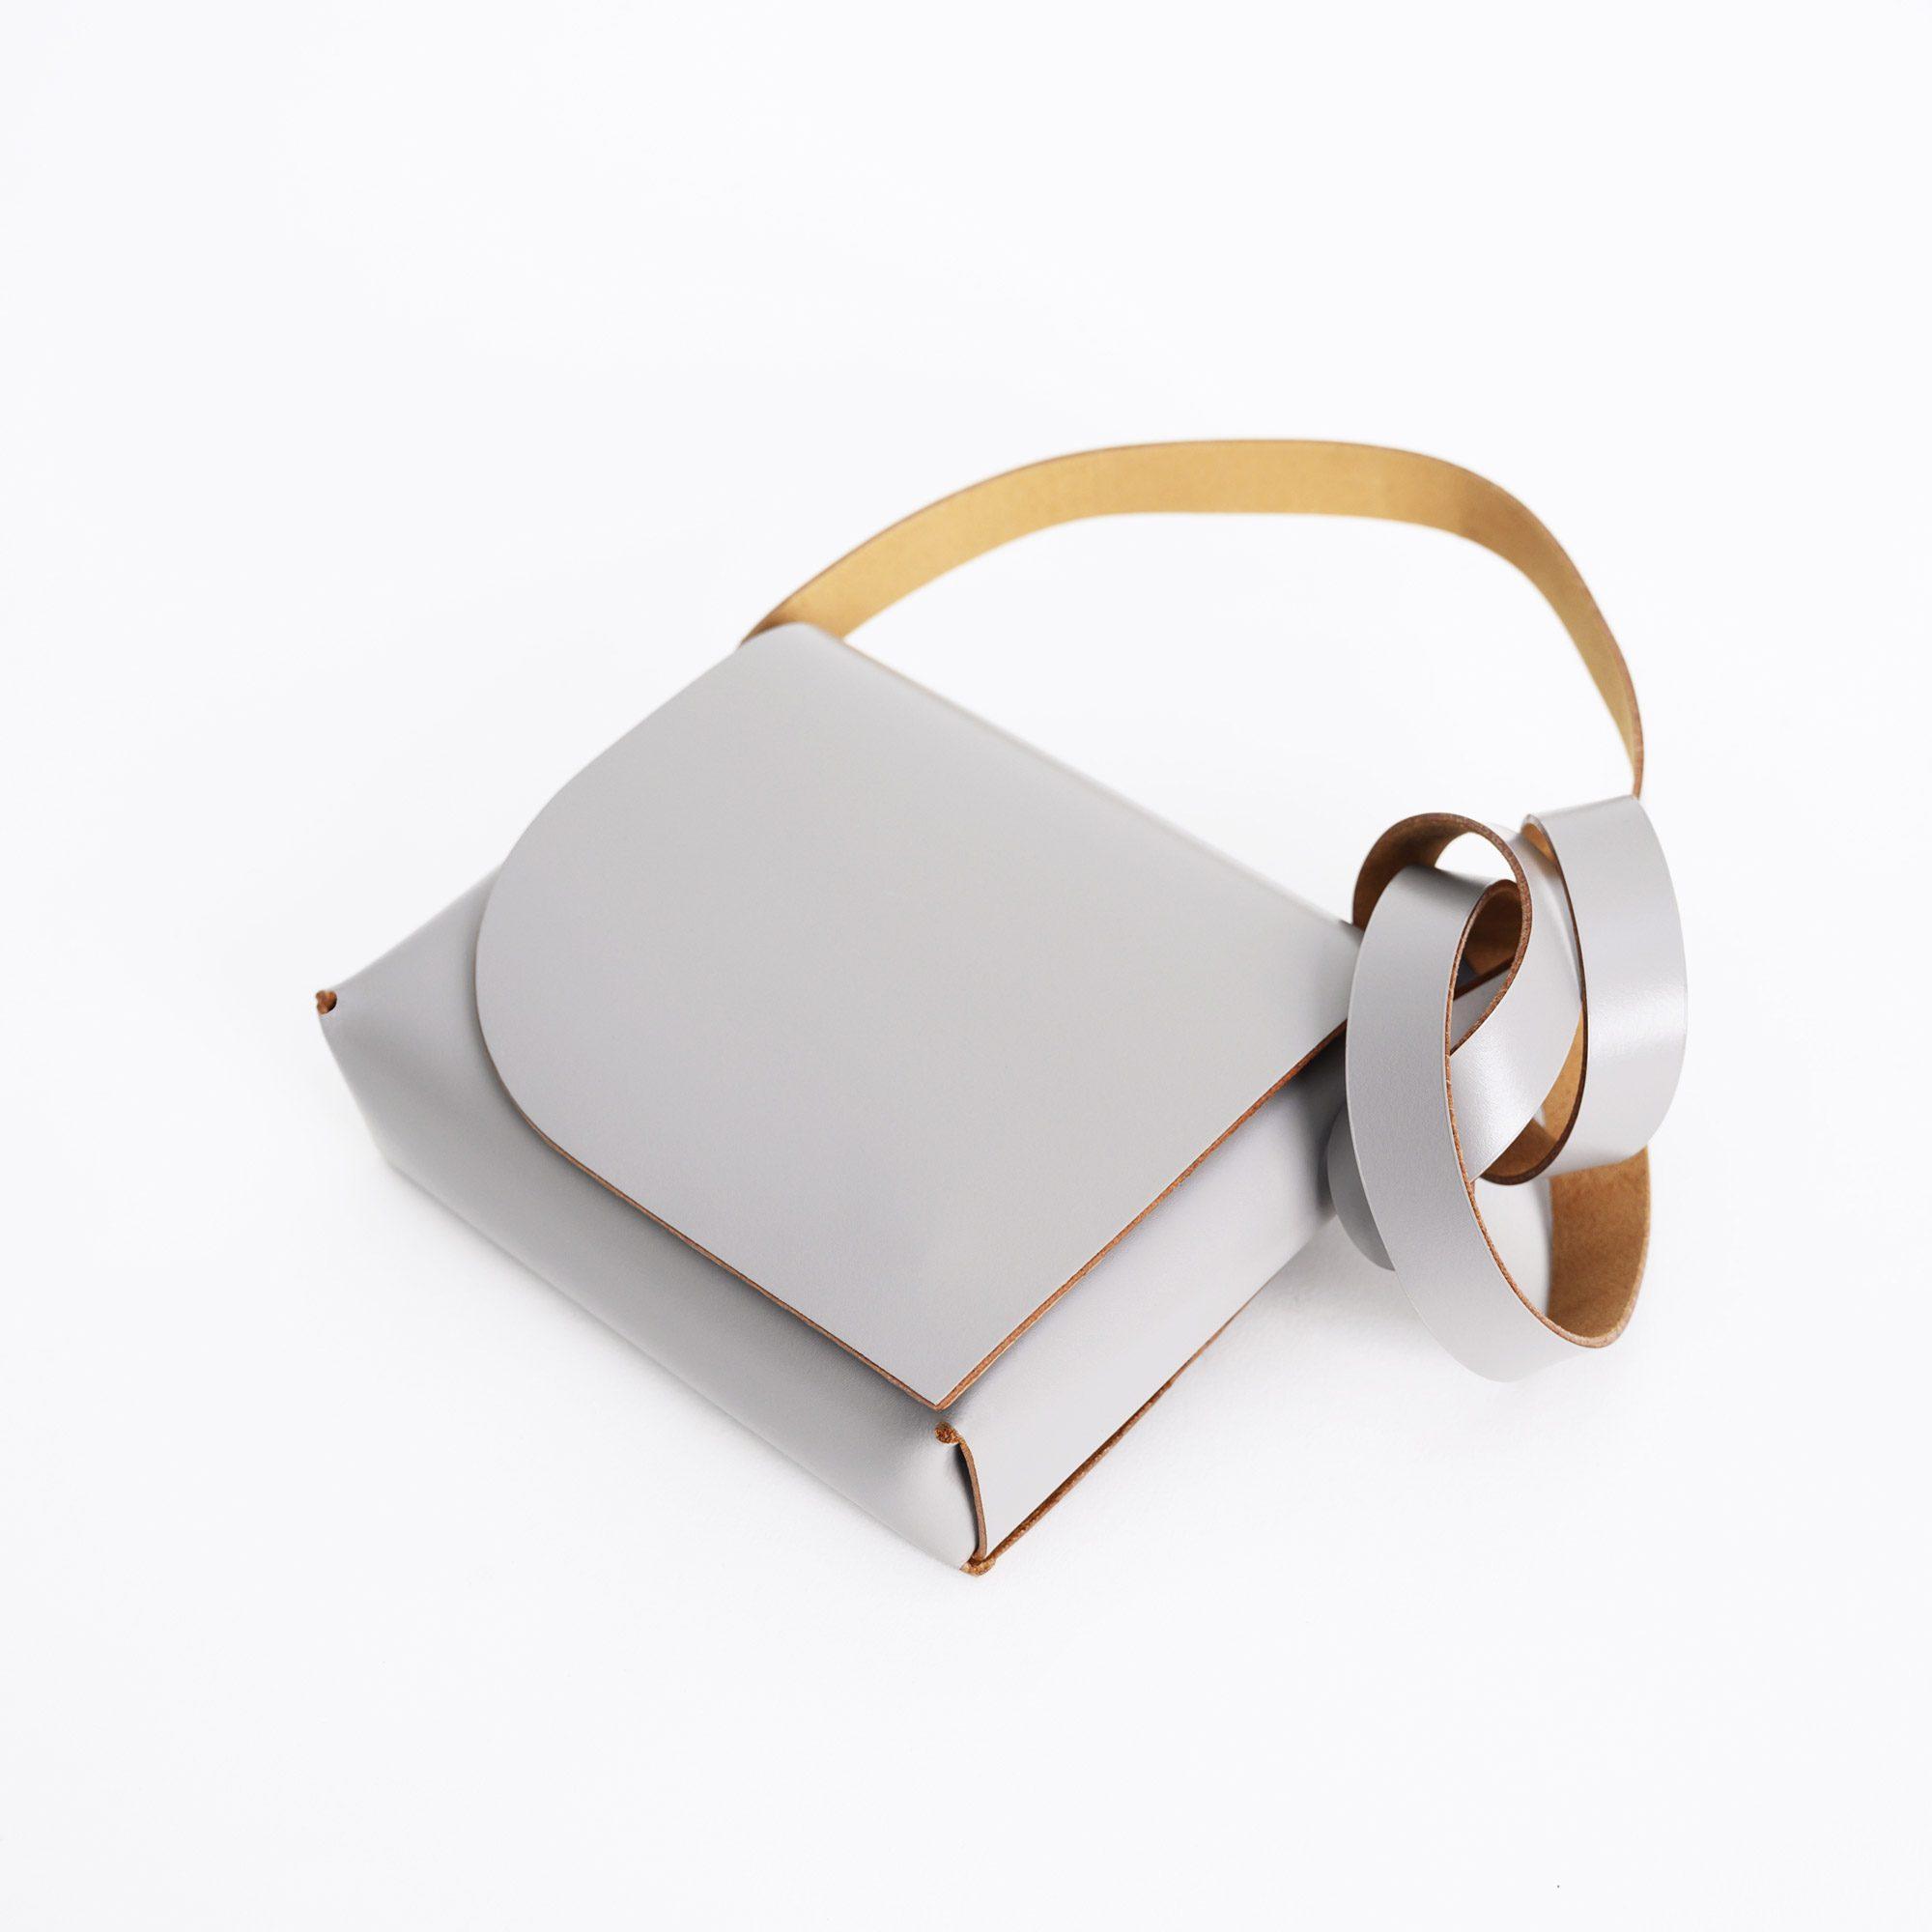 Grey leather bag handmade by PBG